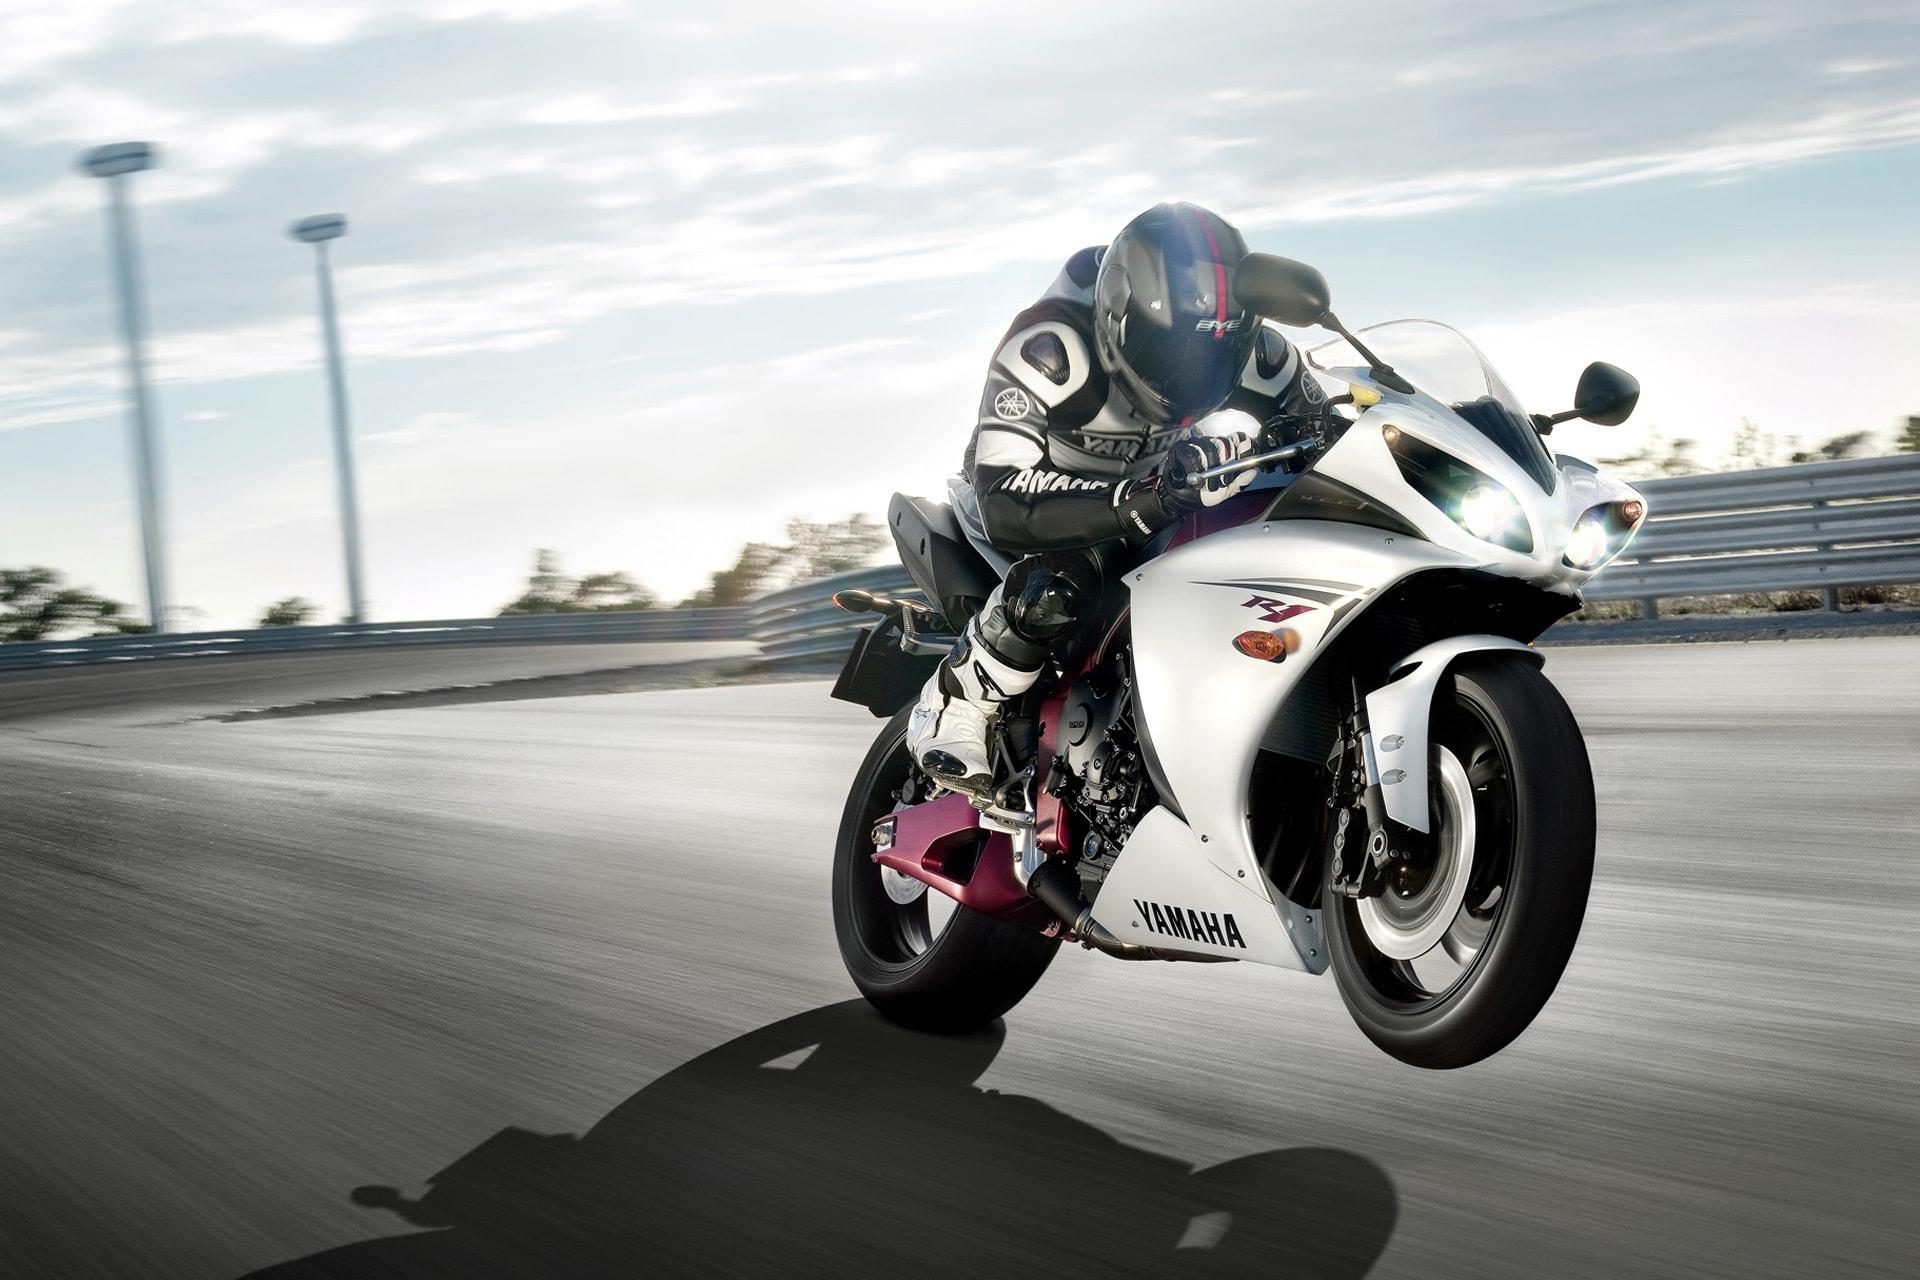 Yamaha Yzf R1 2012 Hd Wallpapers 7wallpapersnet